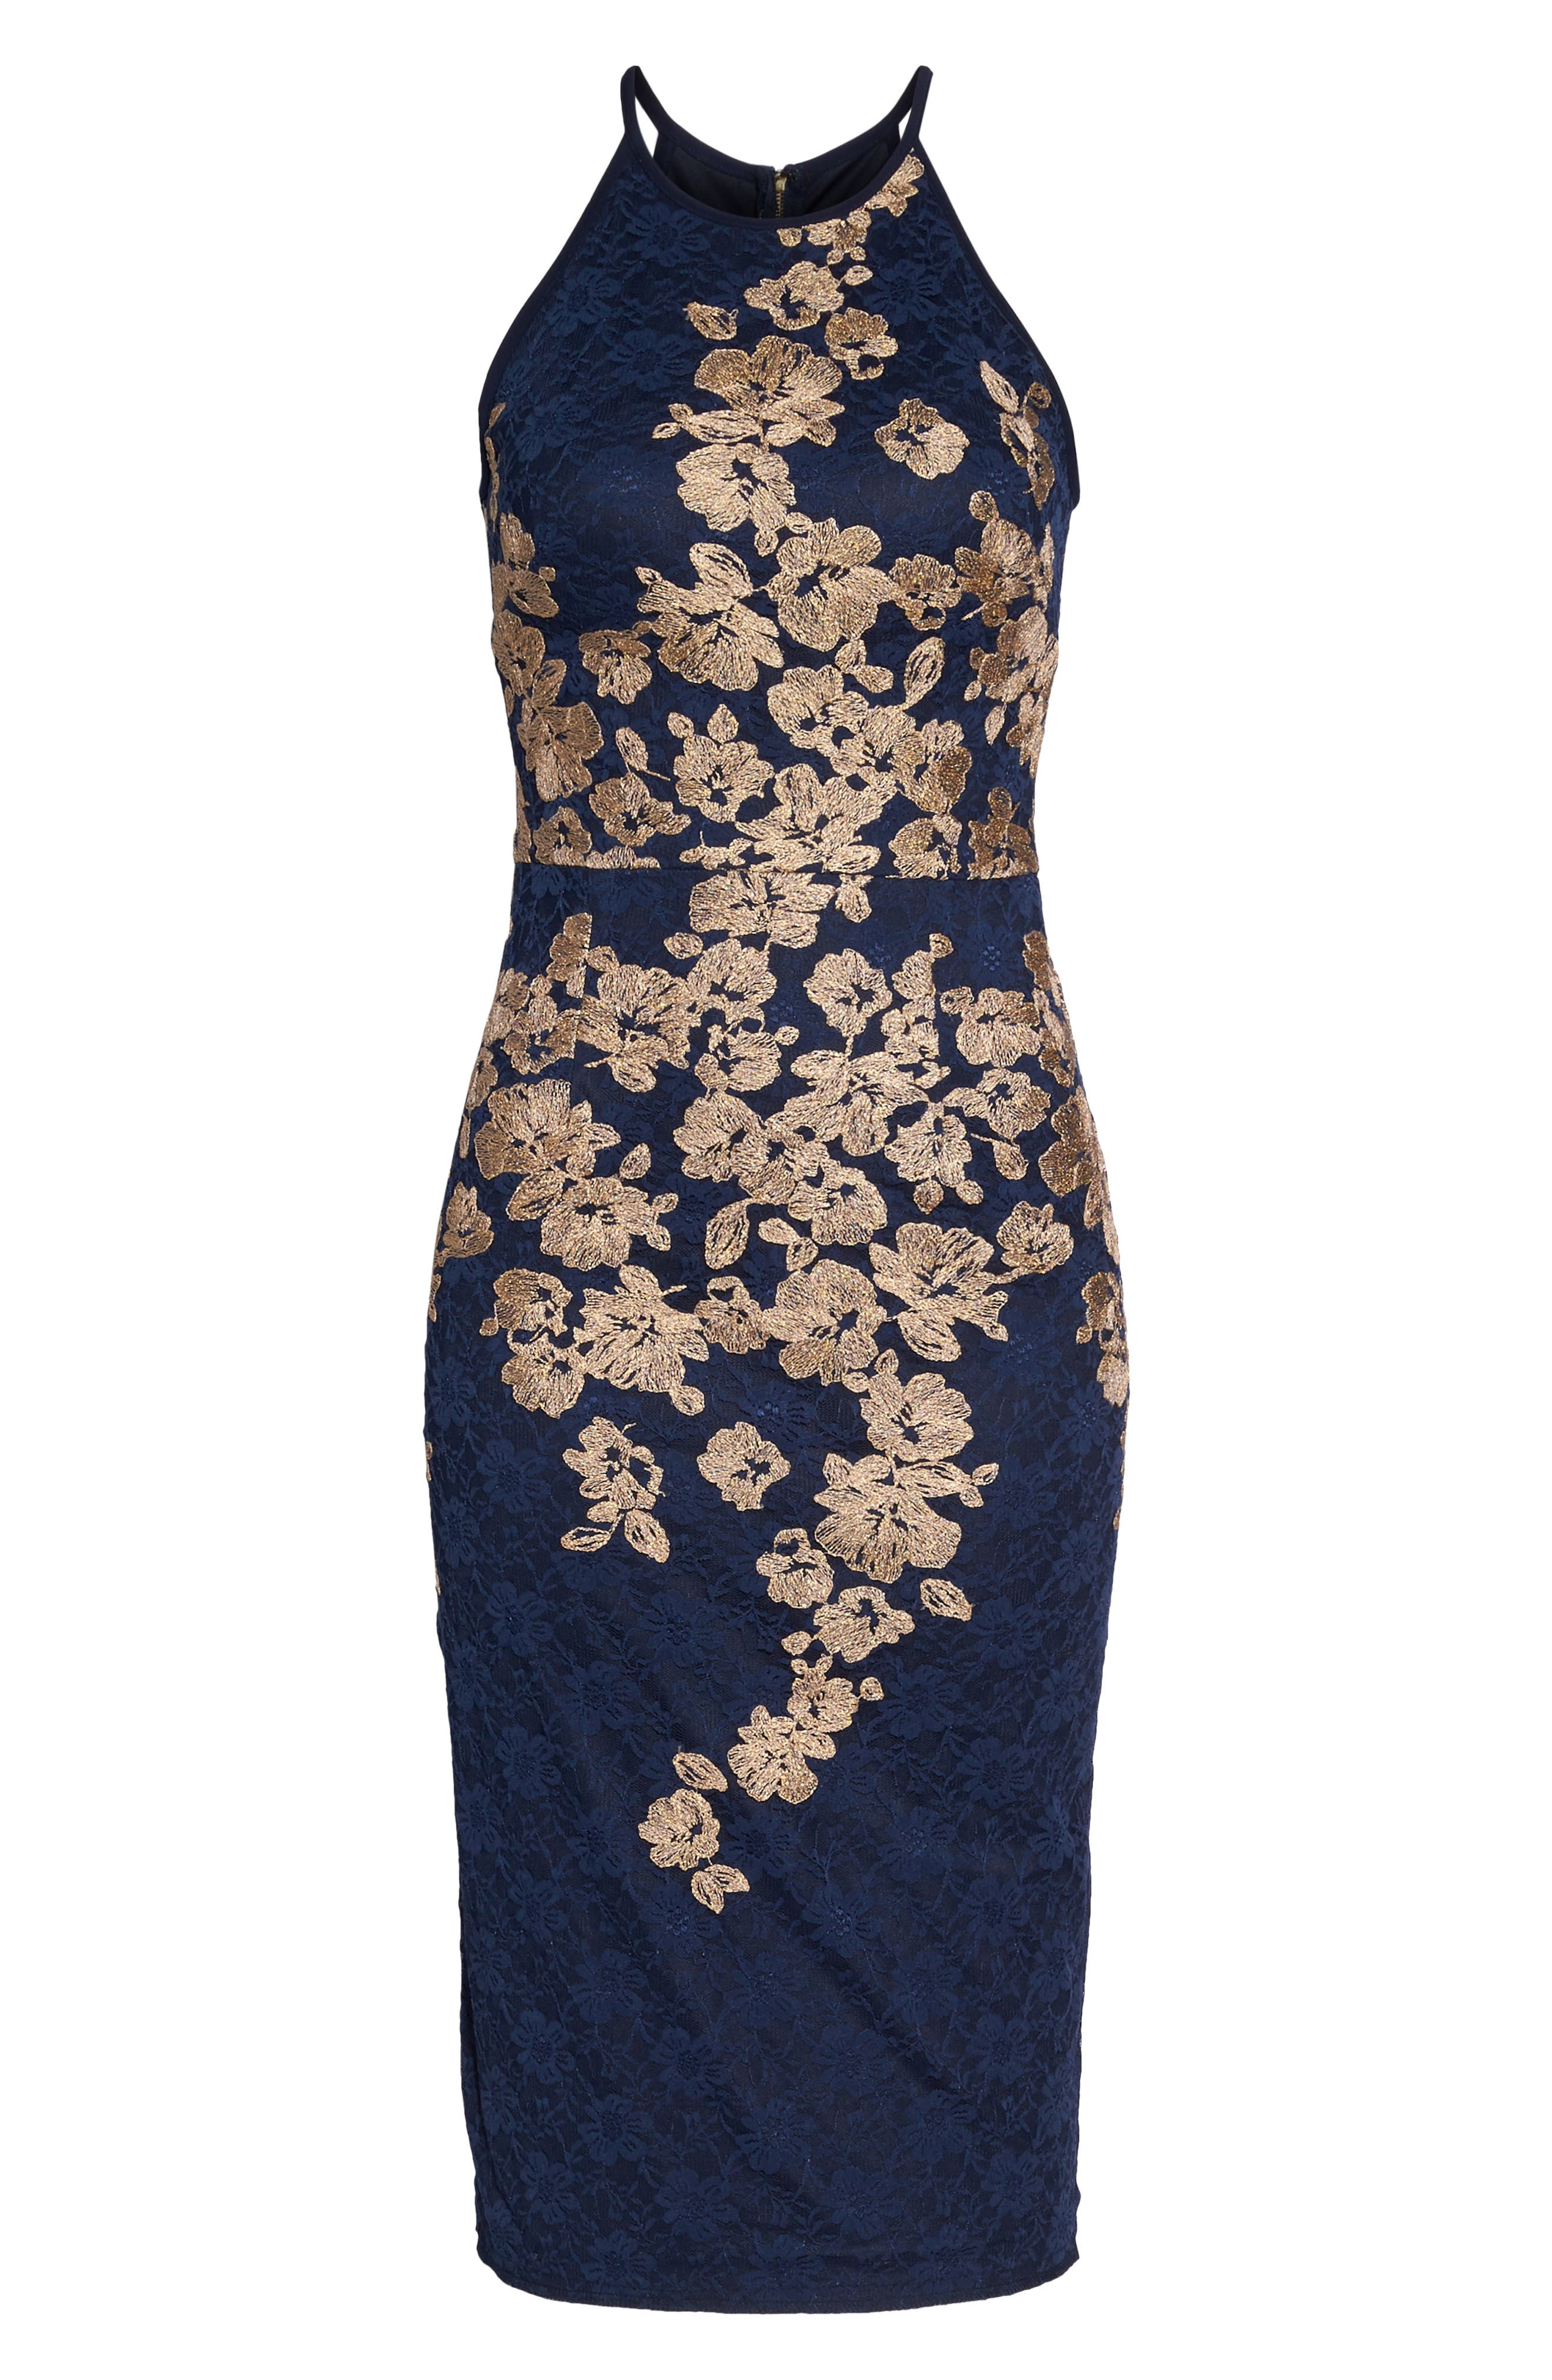 Embroidered Halter Midi Dress,                             Alternate thumbnail 6, color,                             Navy/ Gold